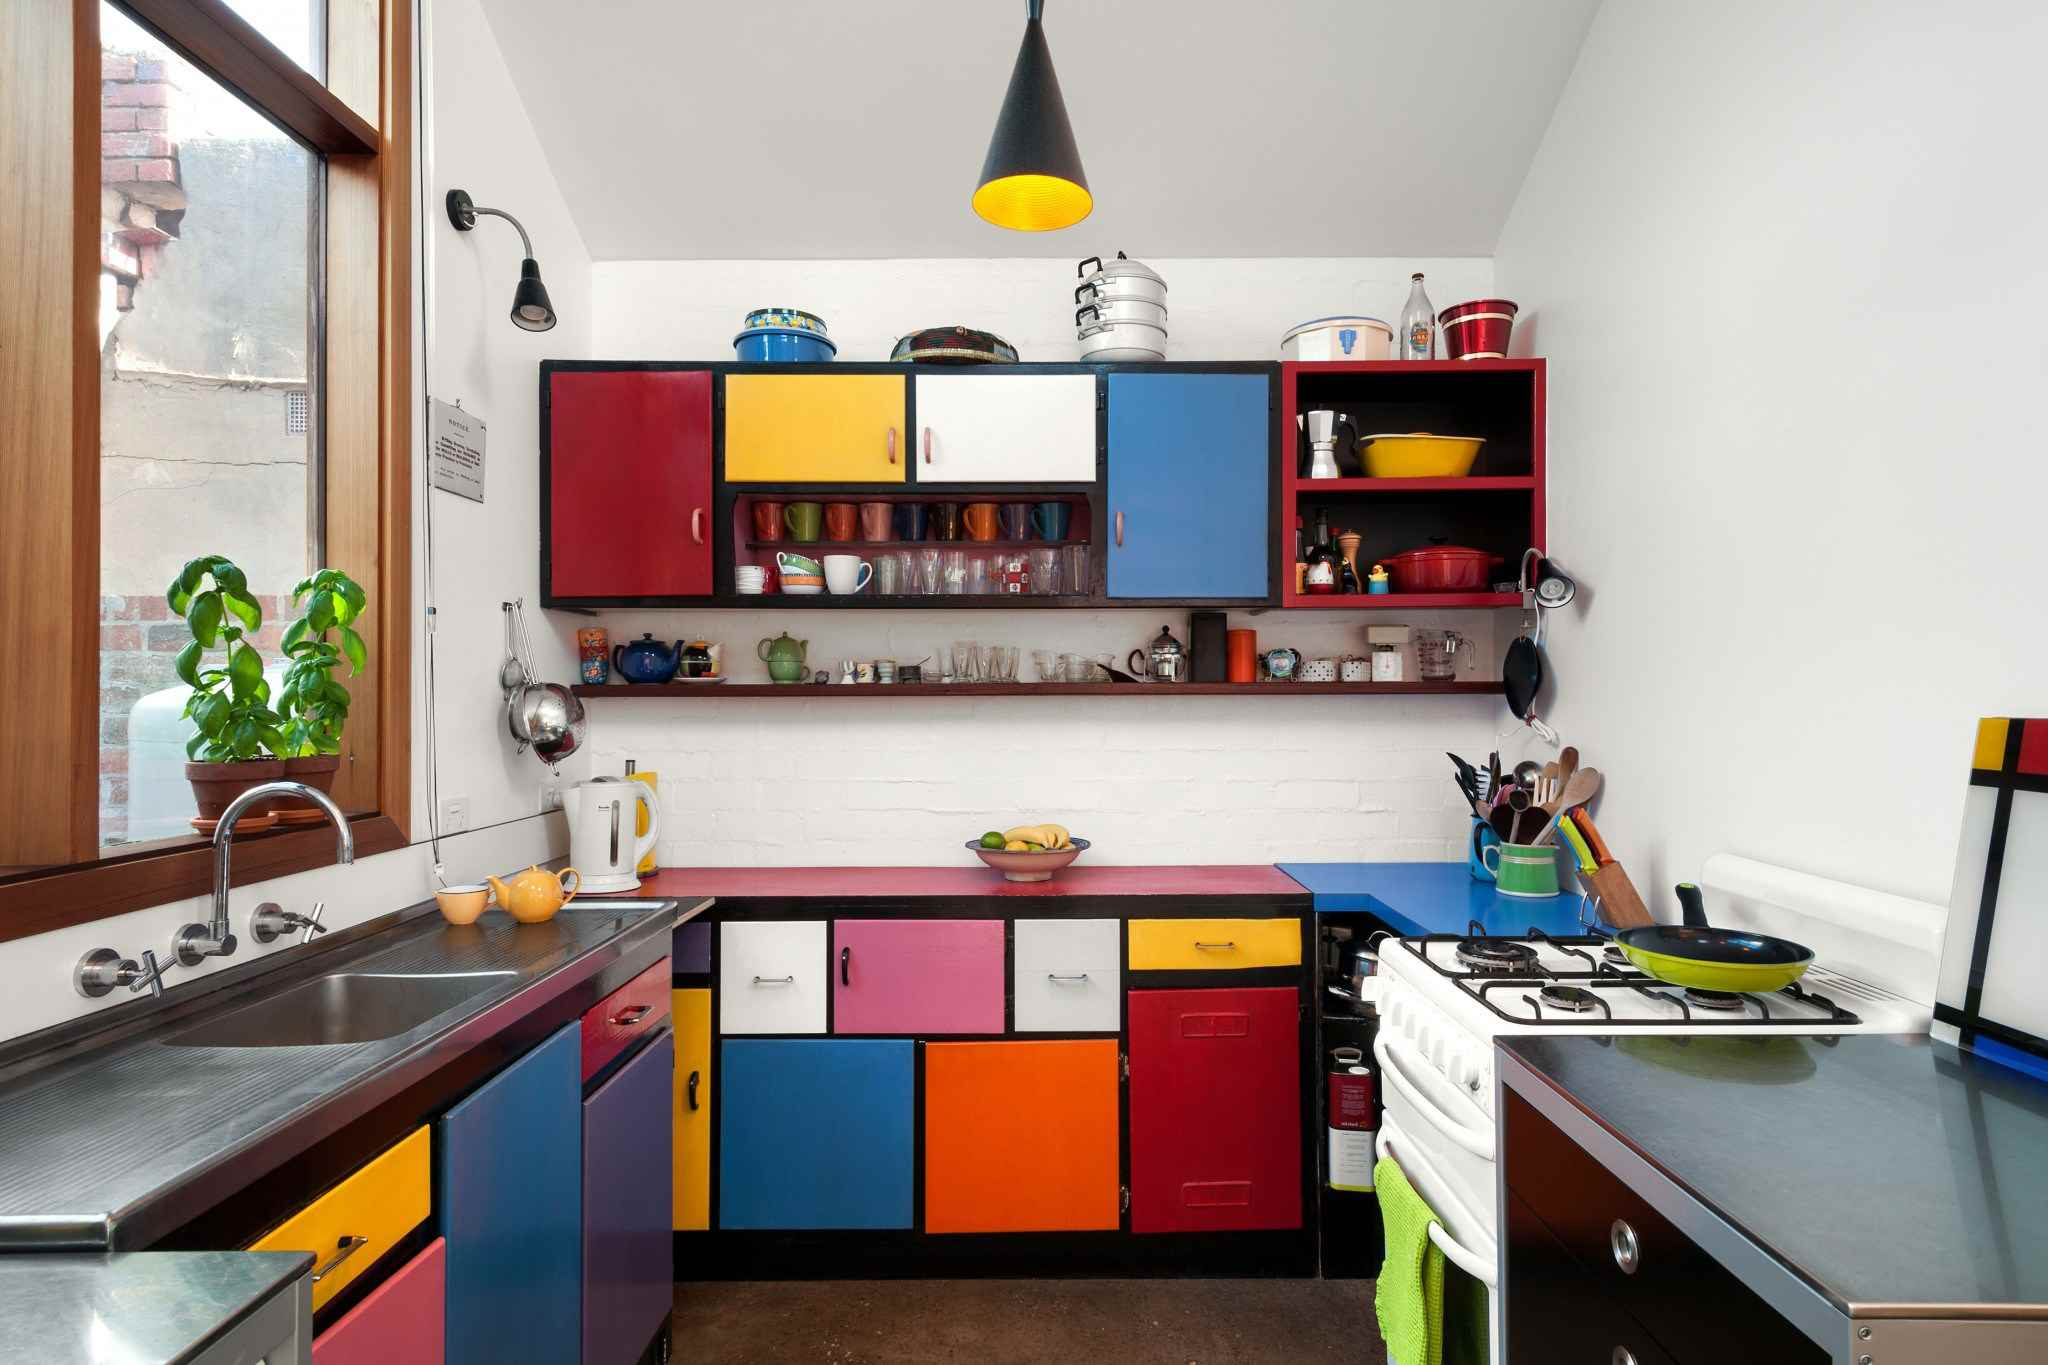 Wonderful colorful cuisine